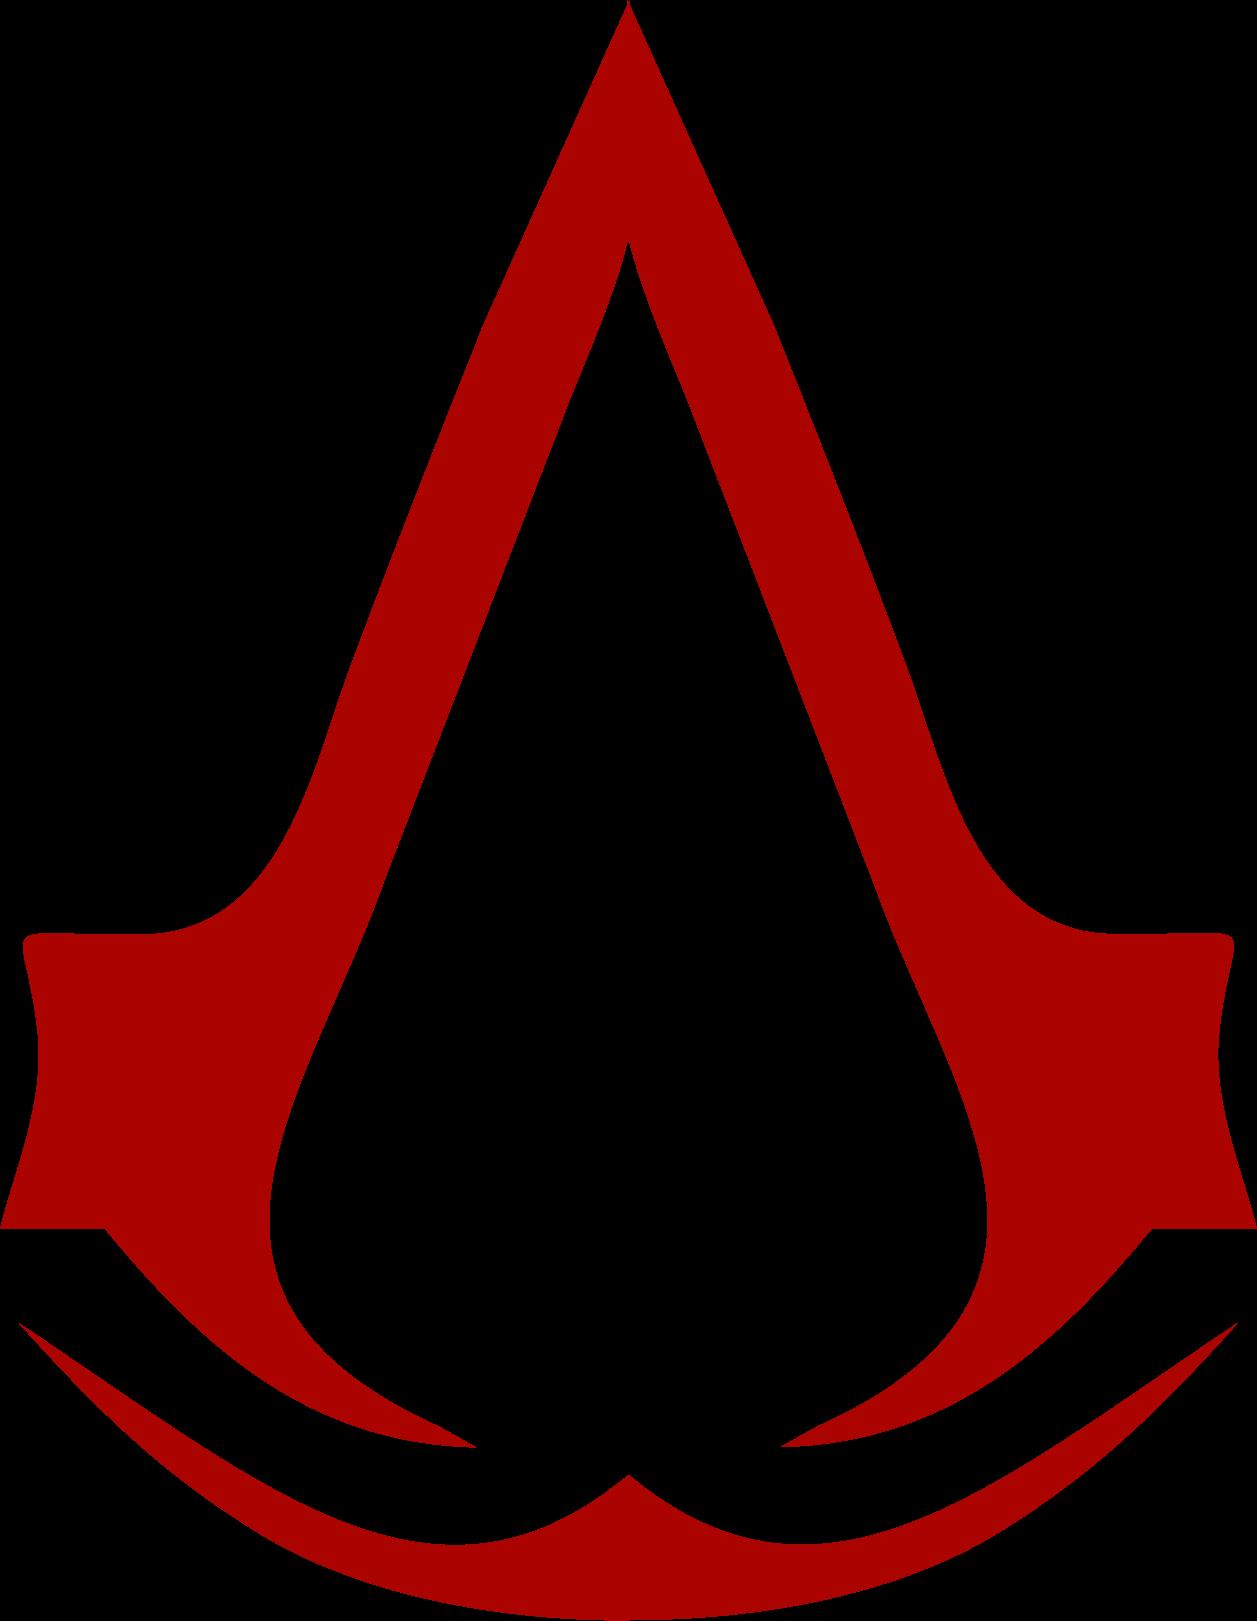 Assassins Creed A Logo Transparent Png Stickpng